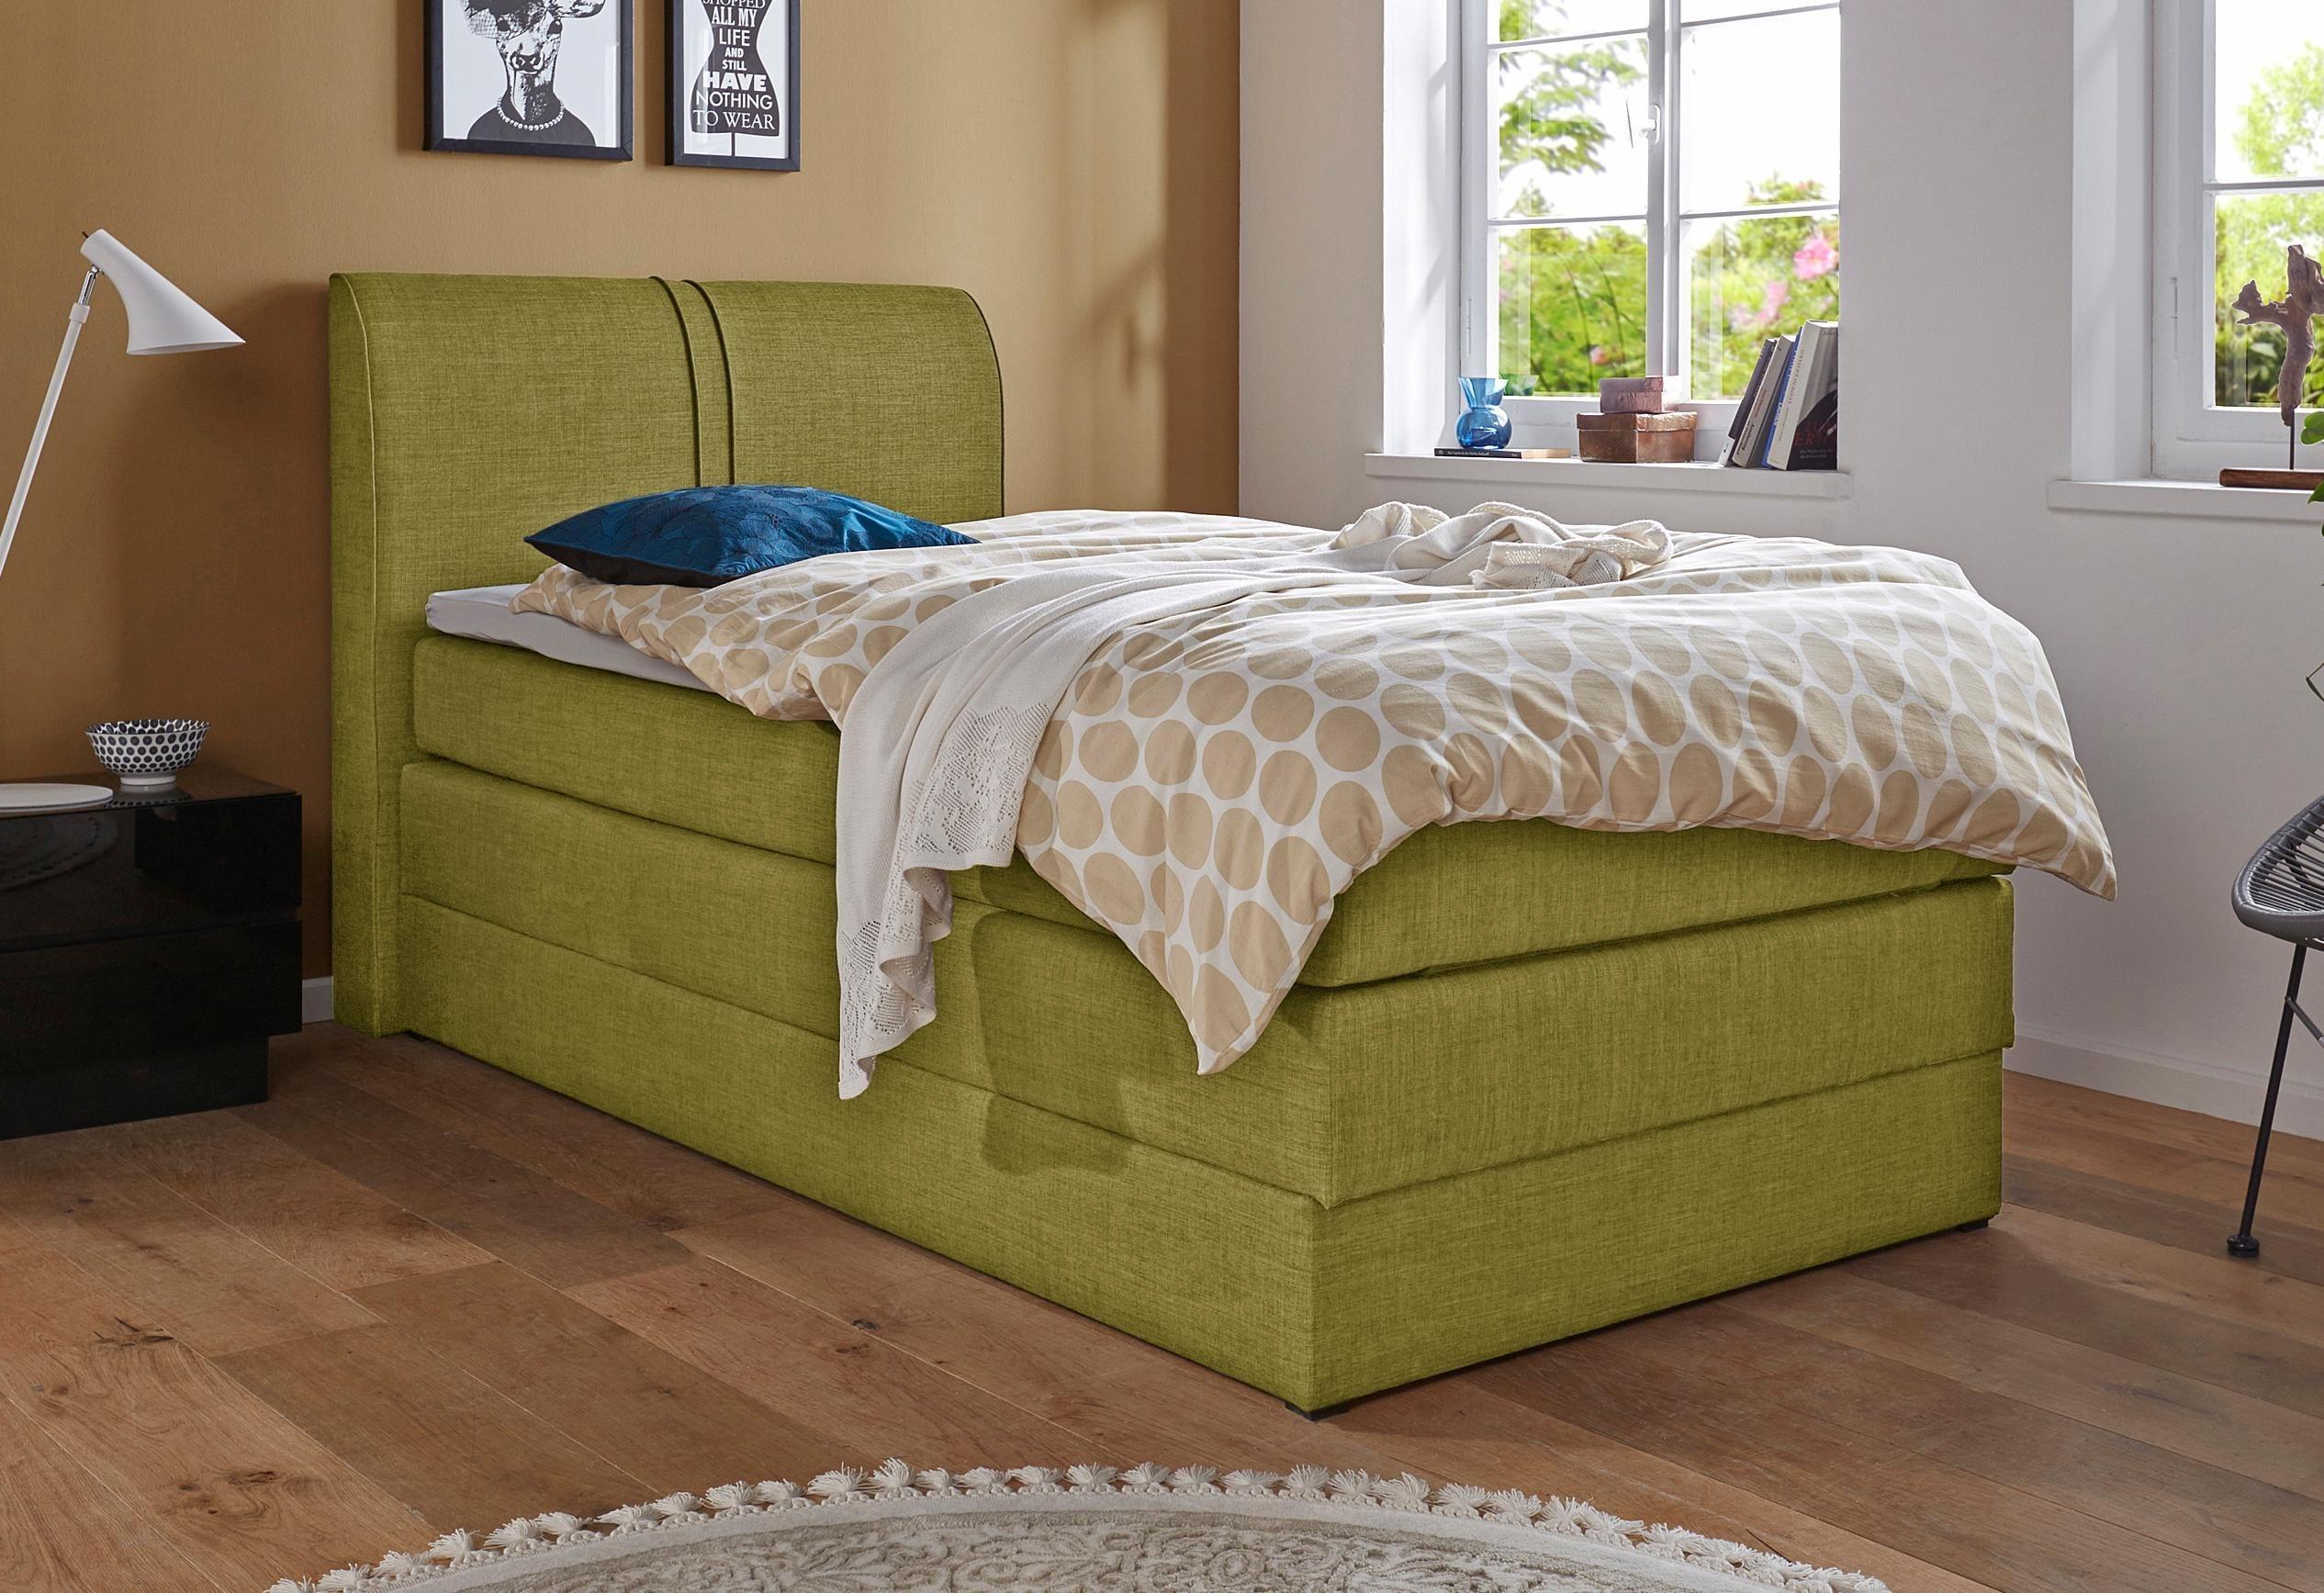 hellbraun kunstleder boxspringbetten online kaufen m bel suchmaschine. Black Bedroom Furniture Sets. Home Design Ideas